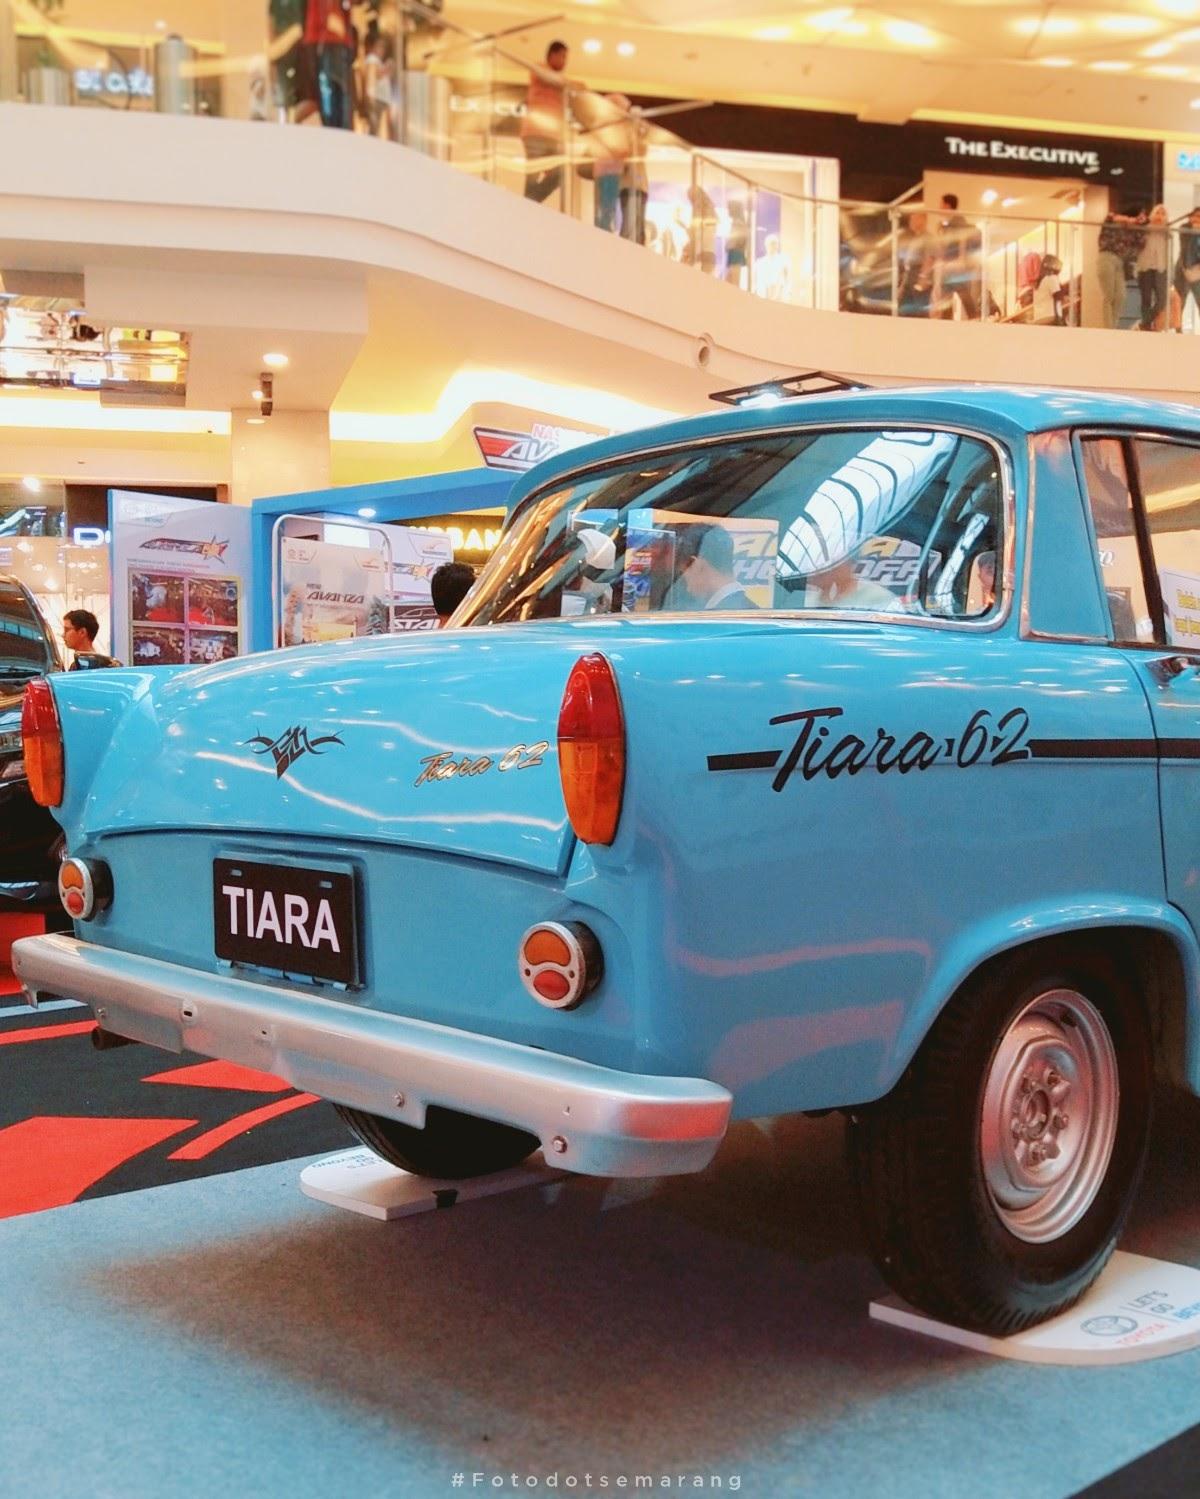 [Photoblog] Toyota Tiara 1962 hingga Toyota AE-86 Sprinter Trueno (Film Initial D)